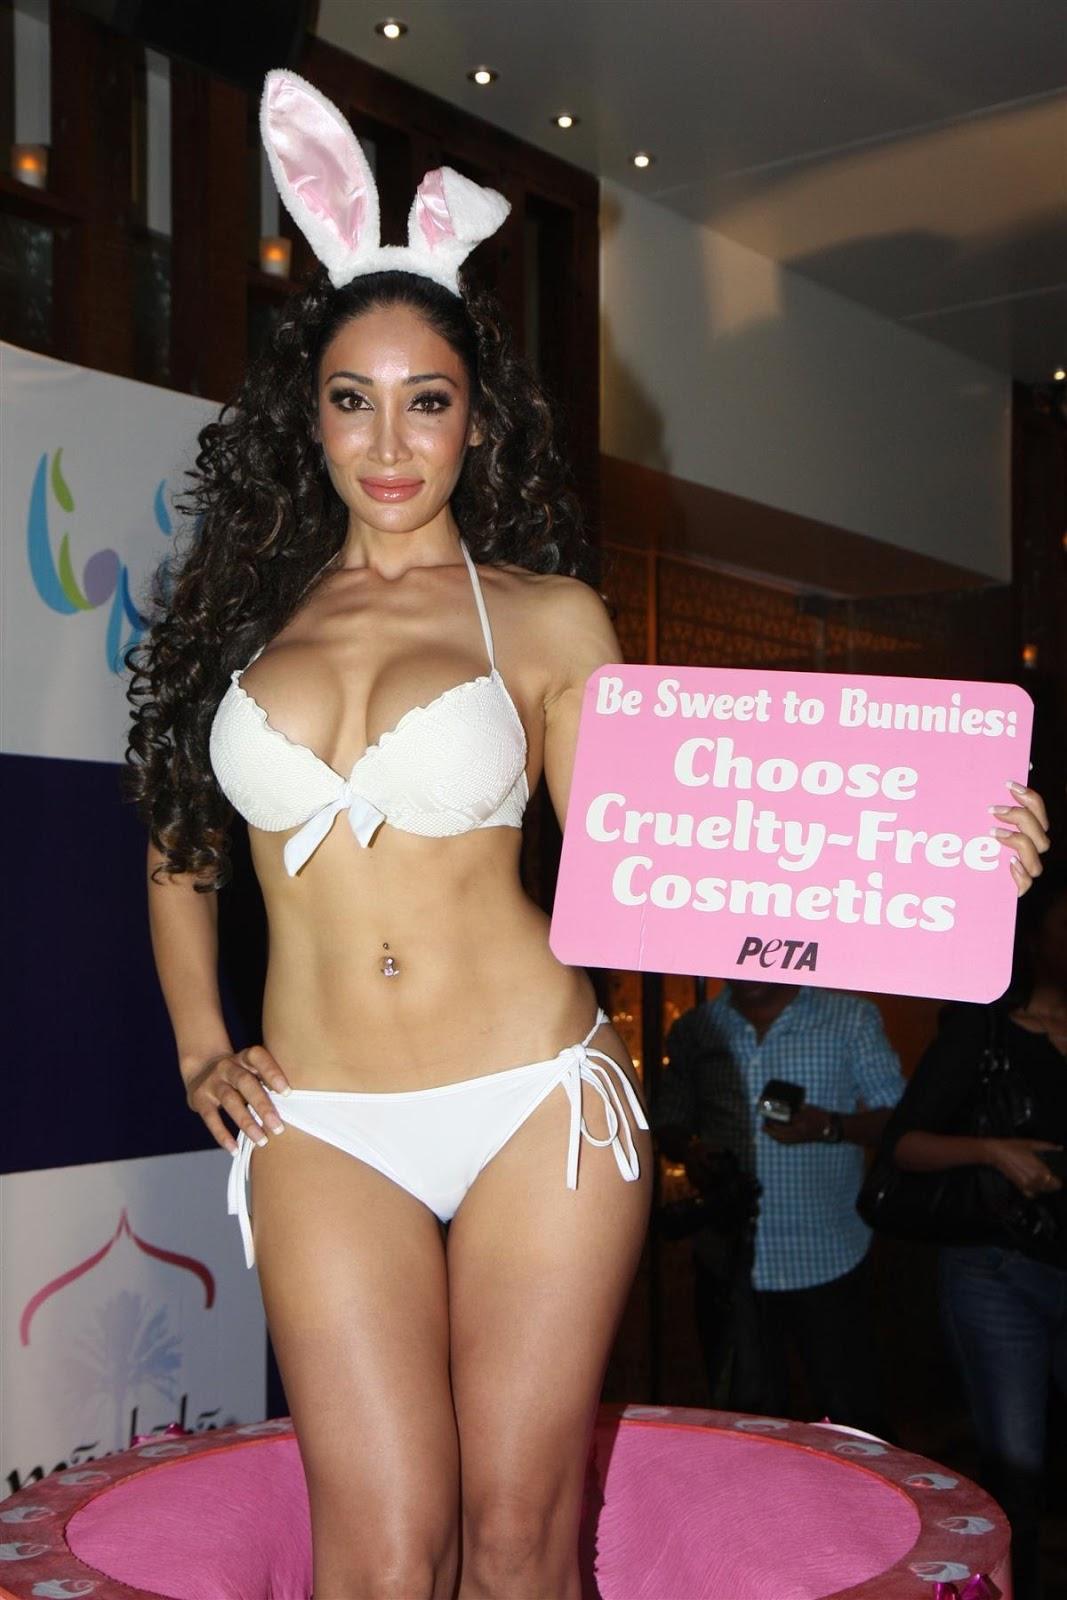 Sofia Hayat's Bikini Photohoot for Peta